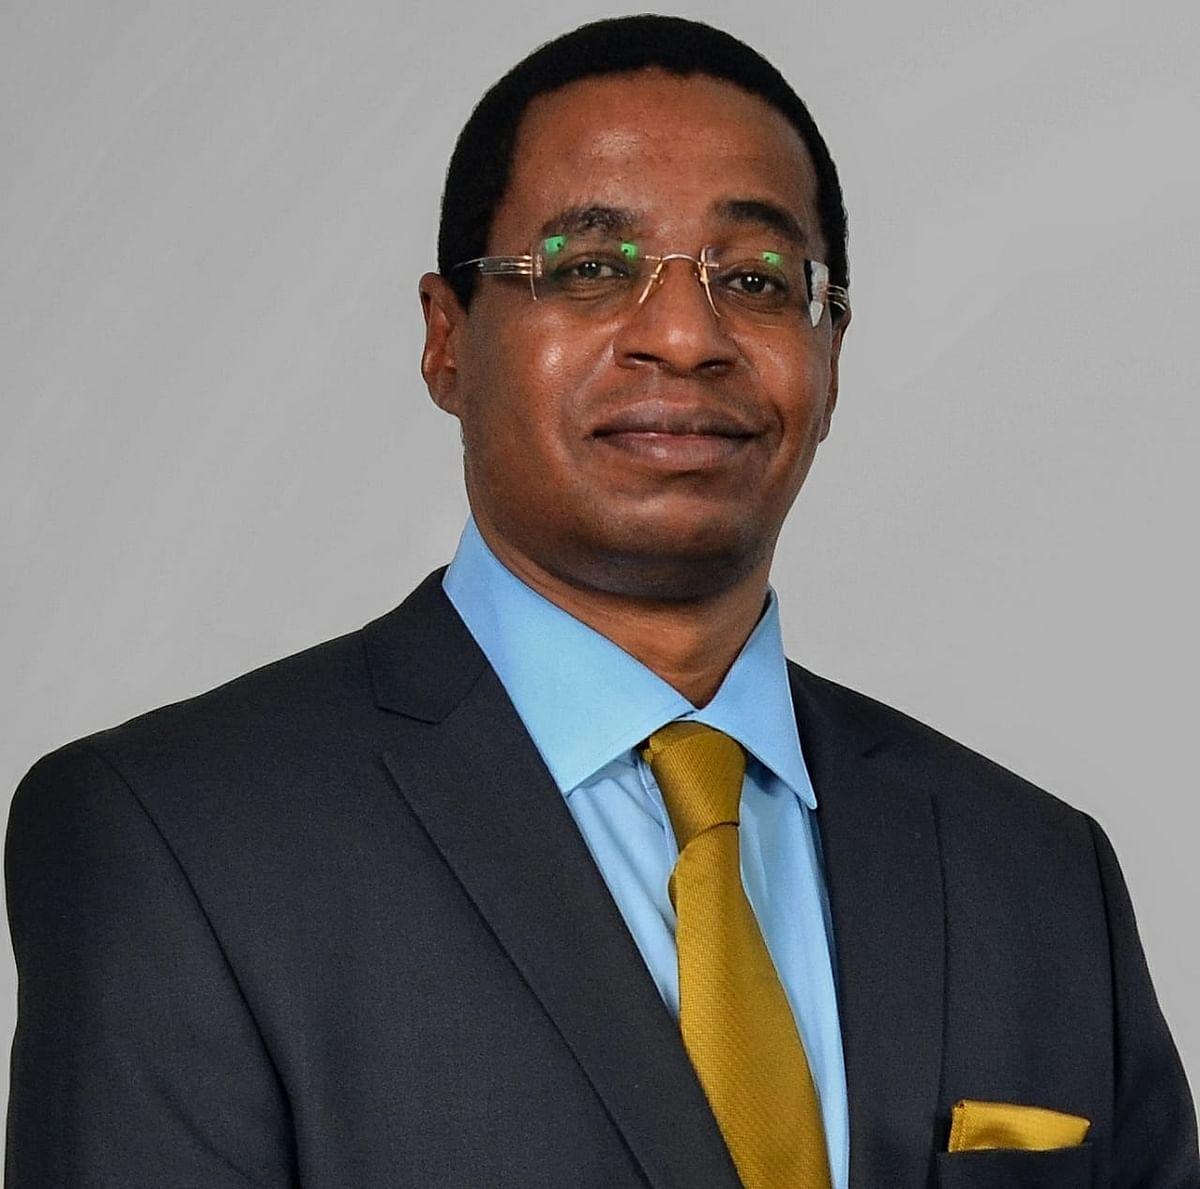 Dr. Kariuki Muigua, PhD, Author: Achieving Sustainable Development, Peace and Environmental Security, Glenwoood Publishers, Nairobi: Kenya (2021)